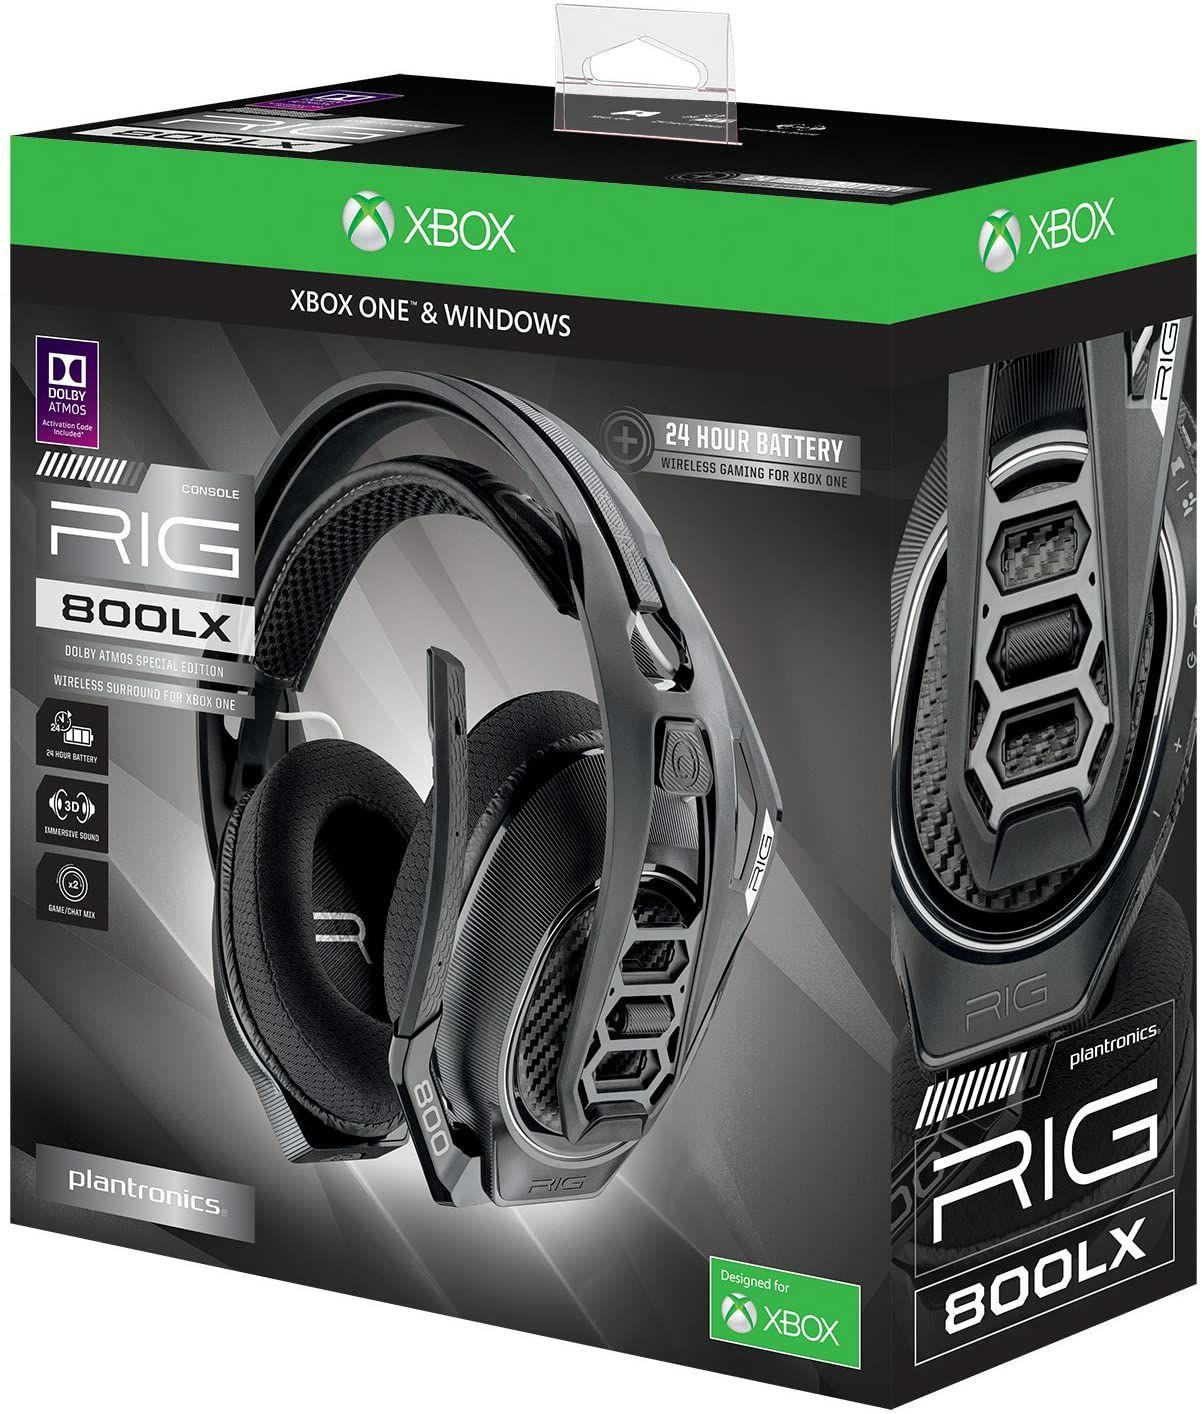 Casque audio sans-fil Plantronics Xbox RIG 800LX V2 - avec micro